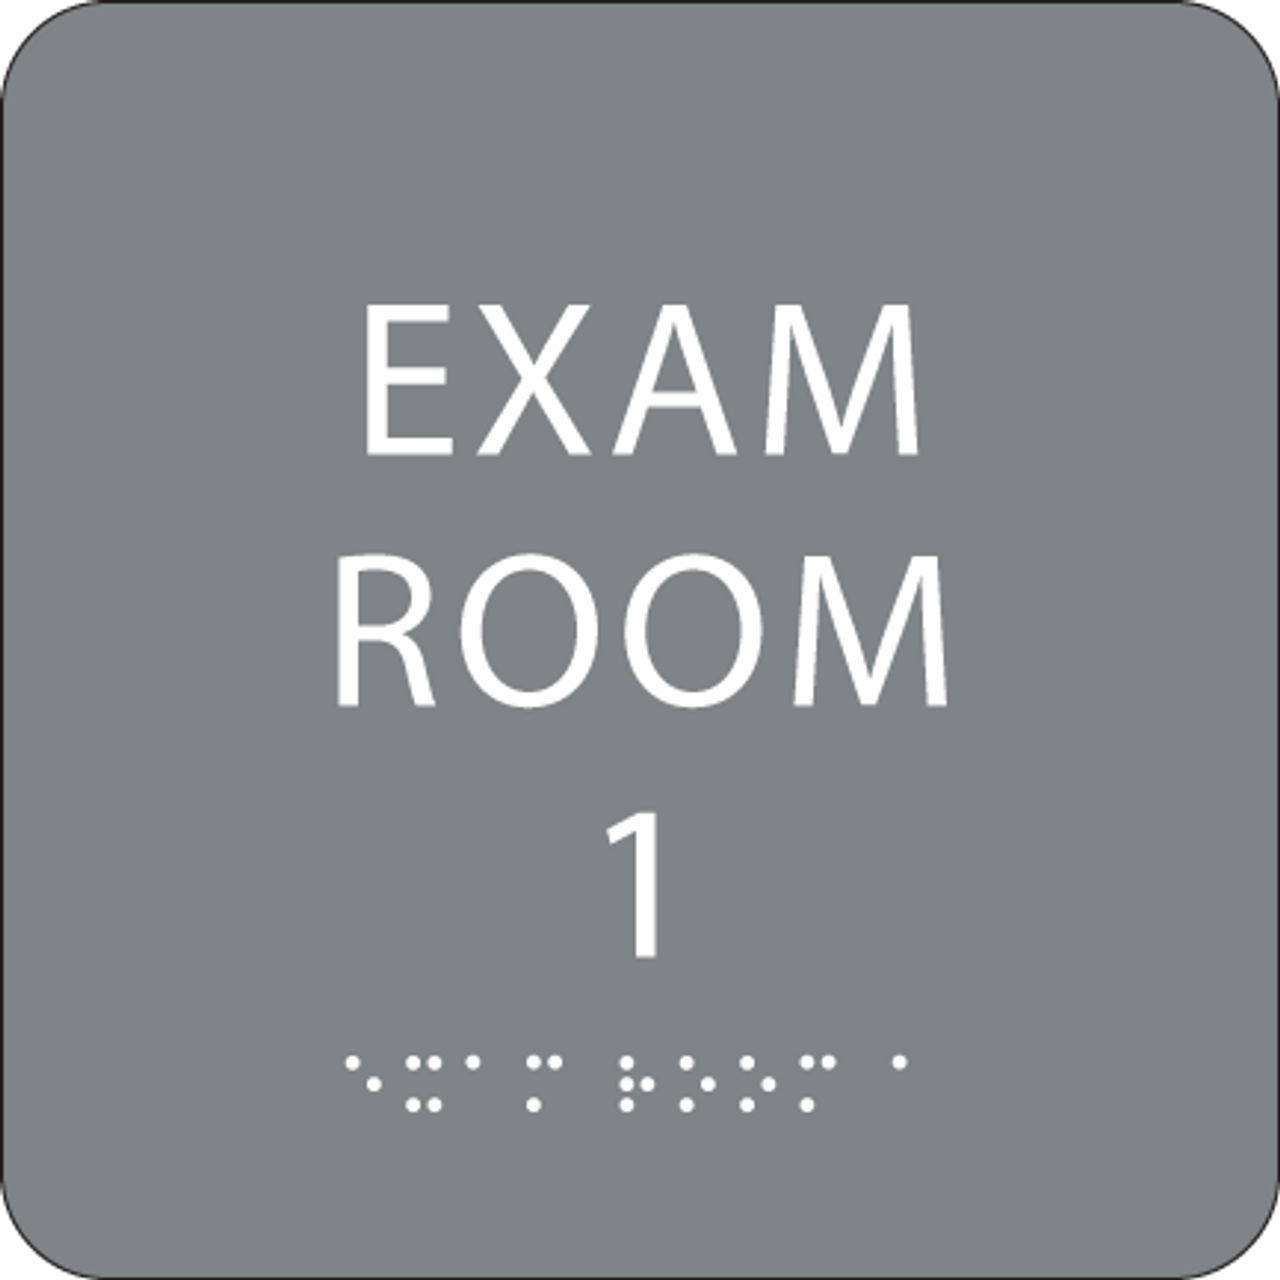 "Exam Room 1 ADA Sign - 6"" x 6"""